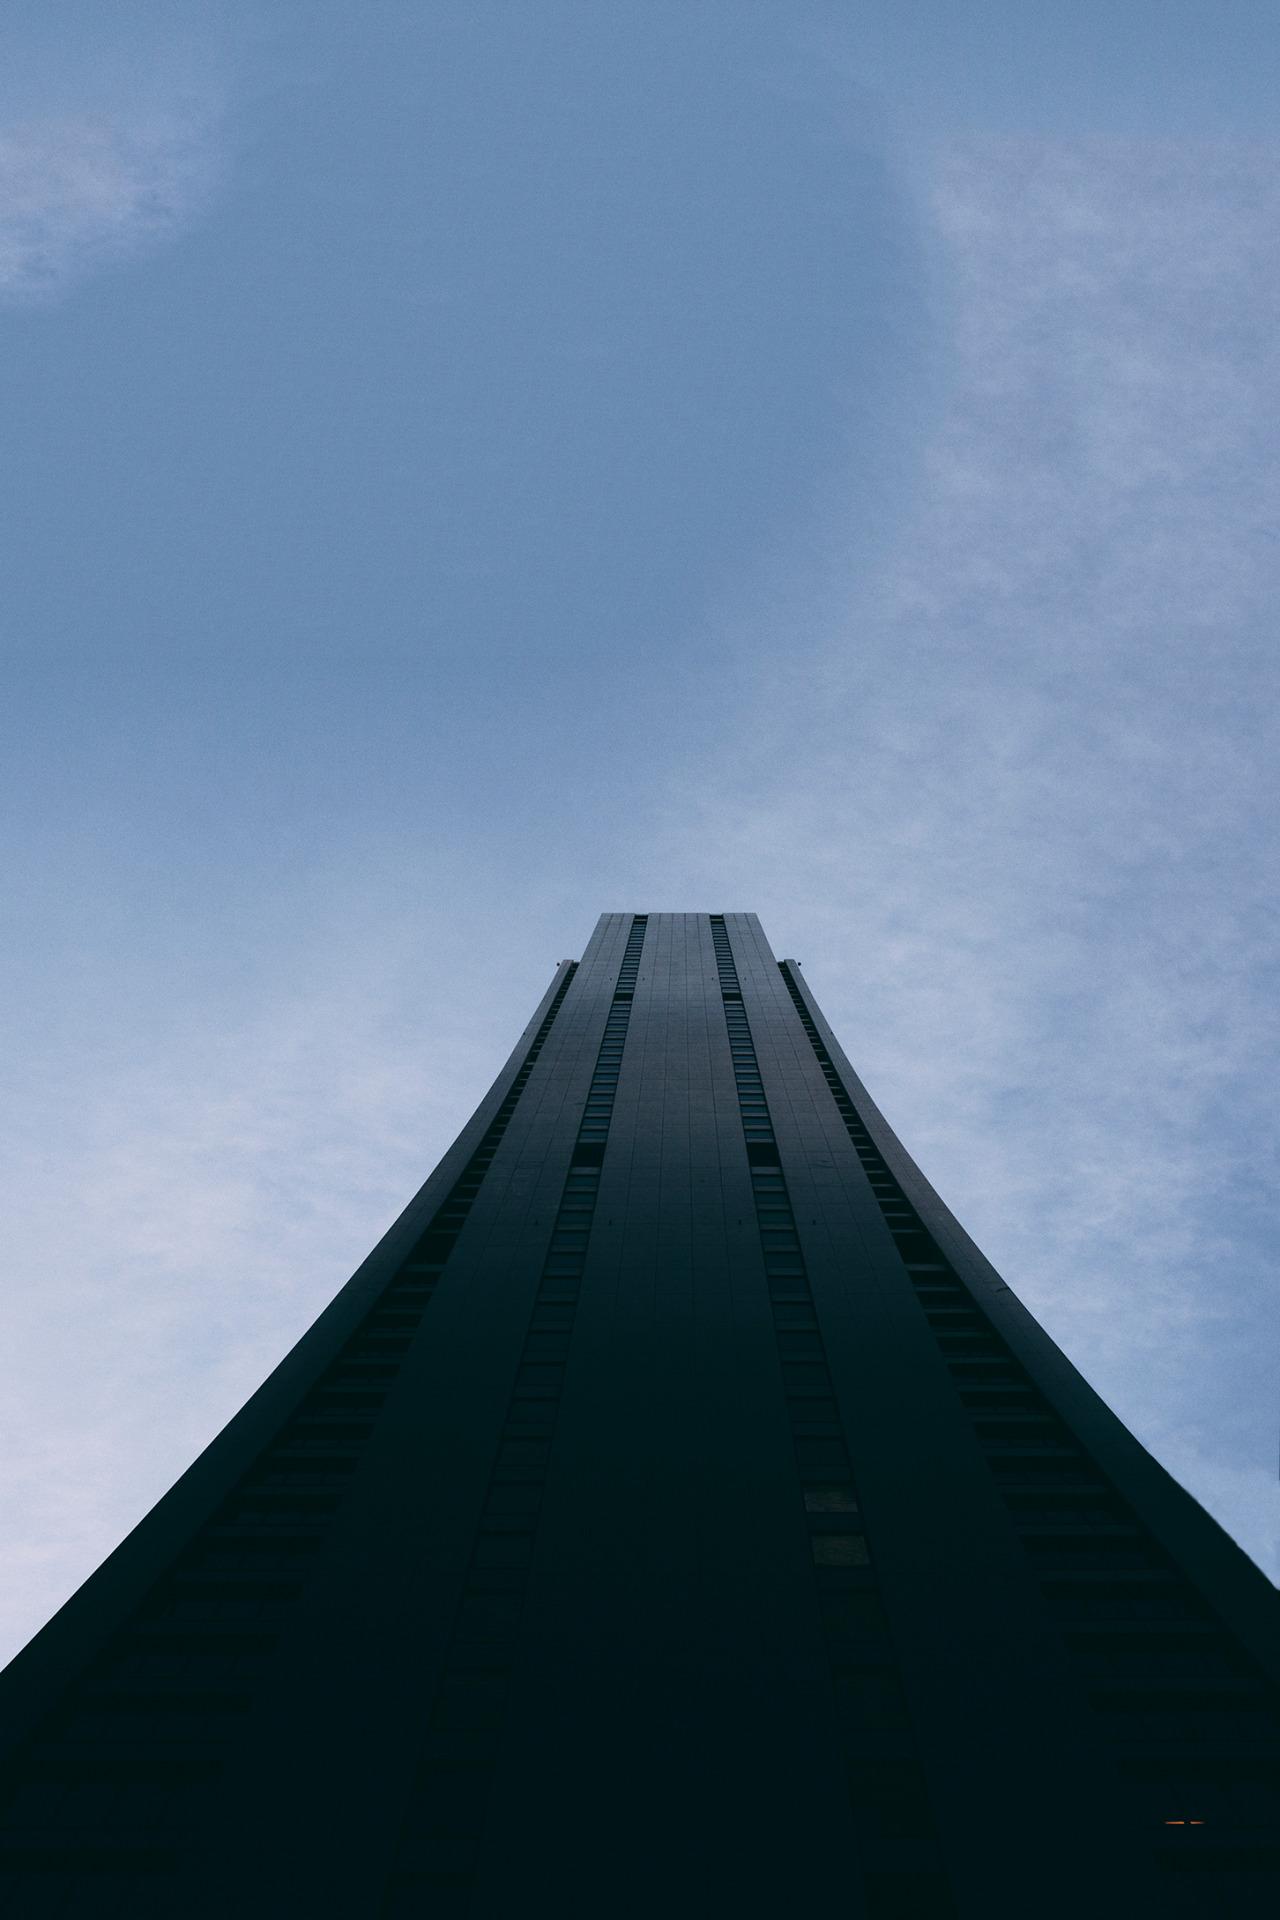 skyscraper black tower bottom view sky 1280x1920